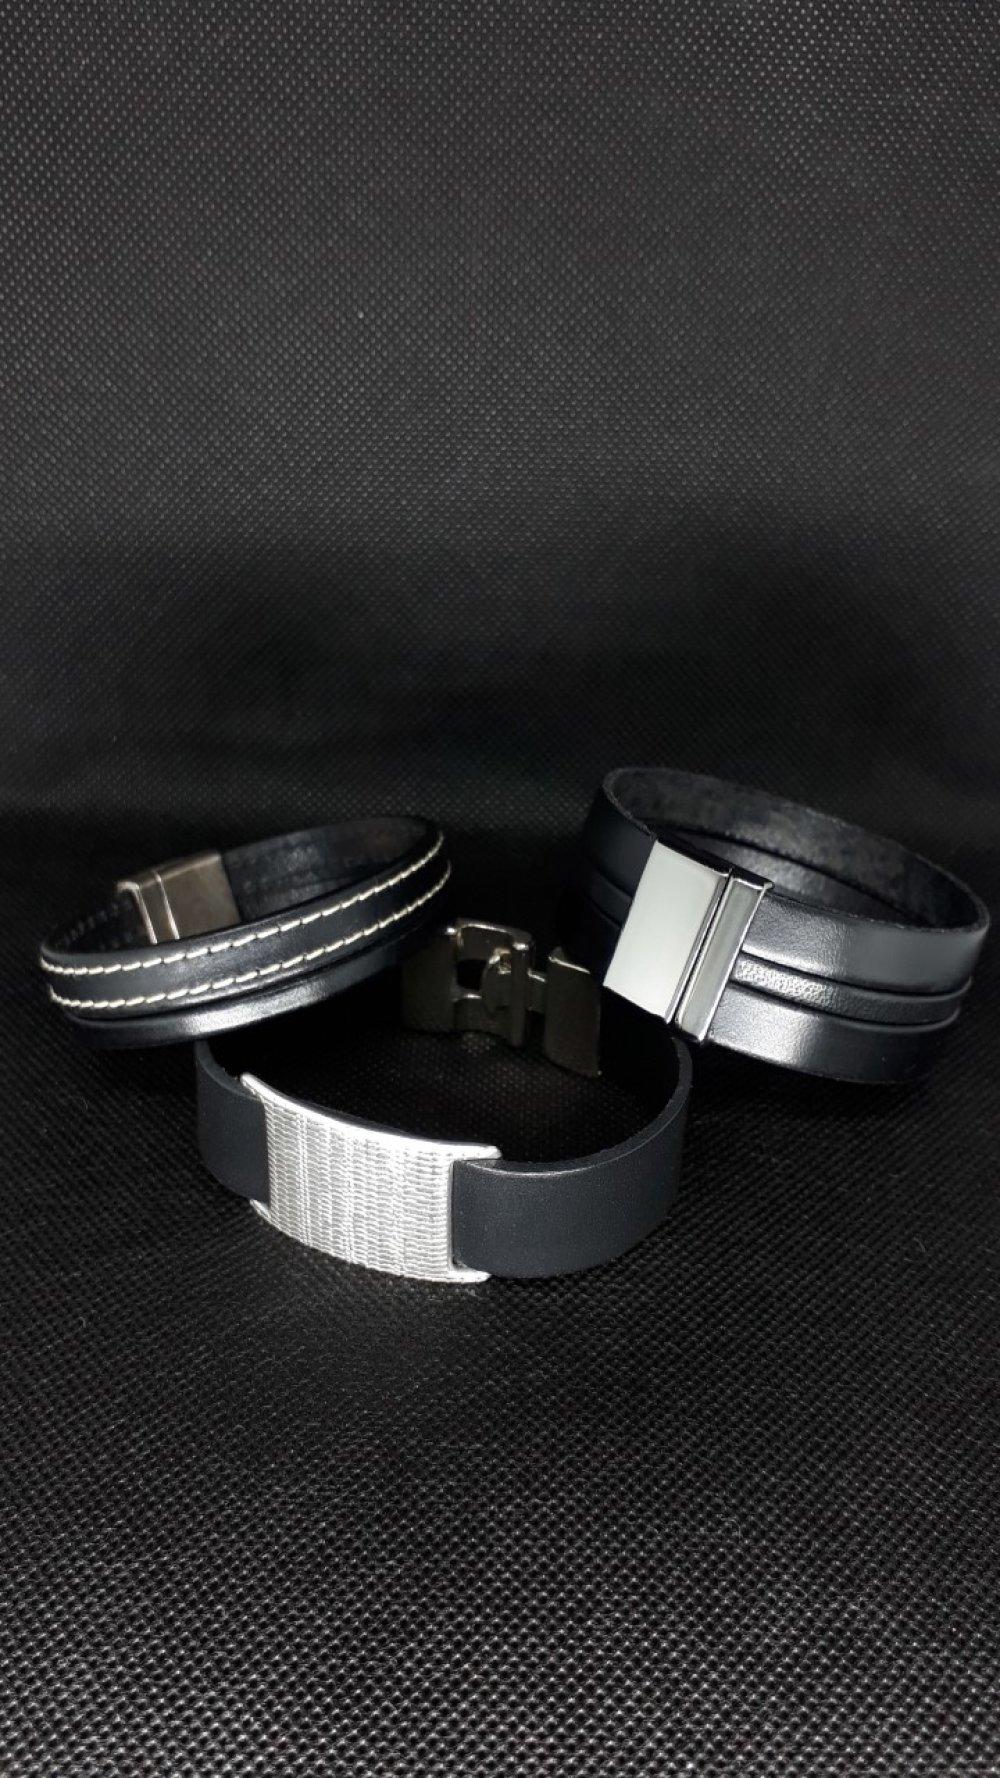 DESTOCKAGE HOMME Bracelet cuir noir